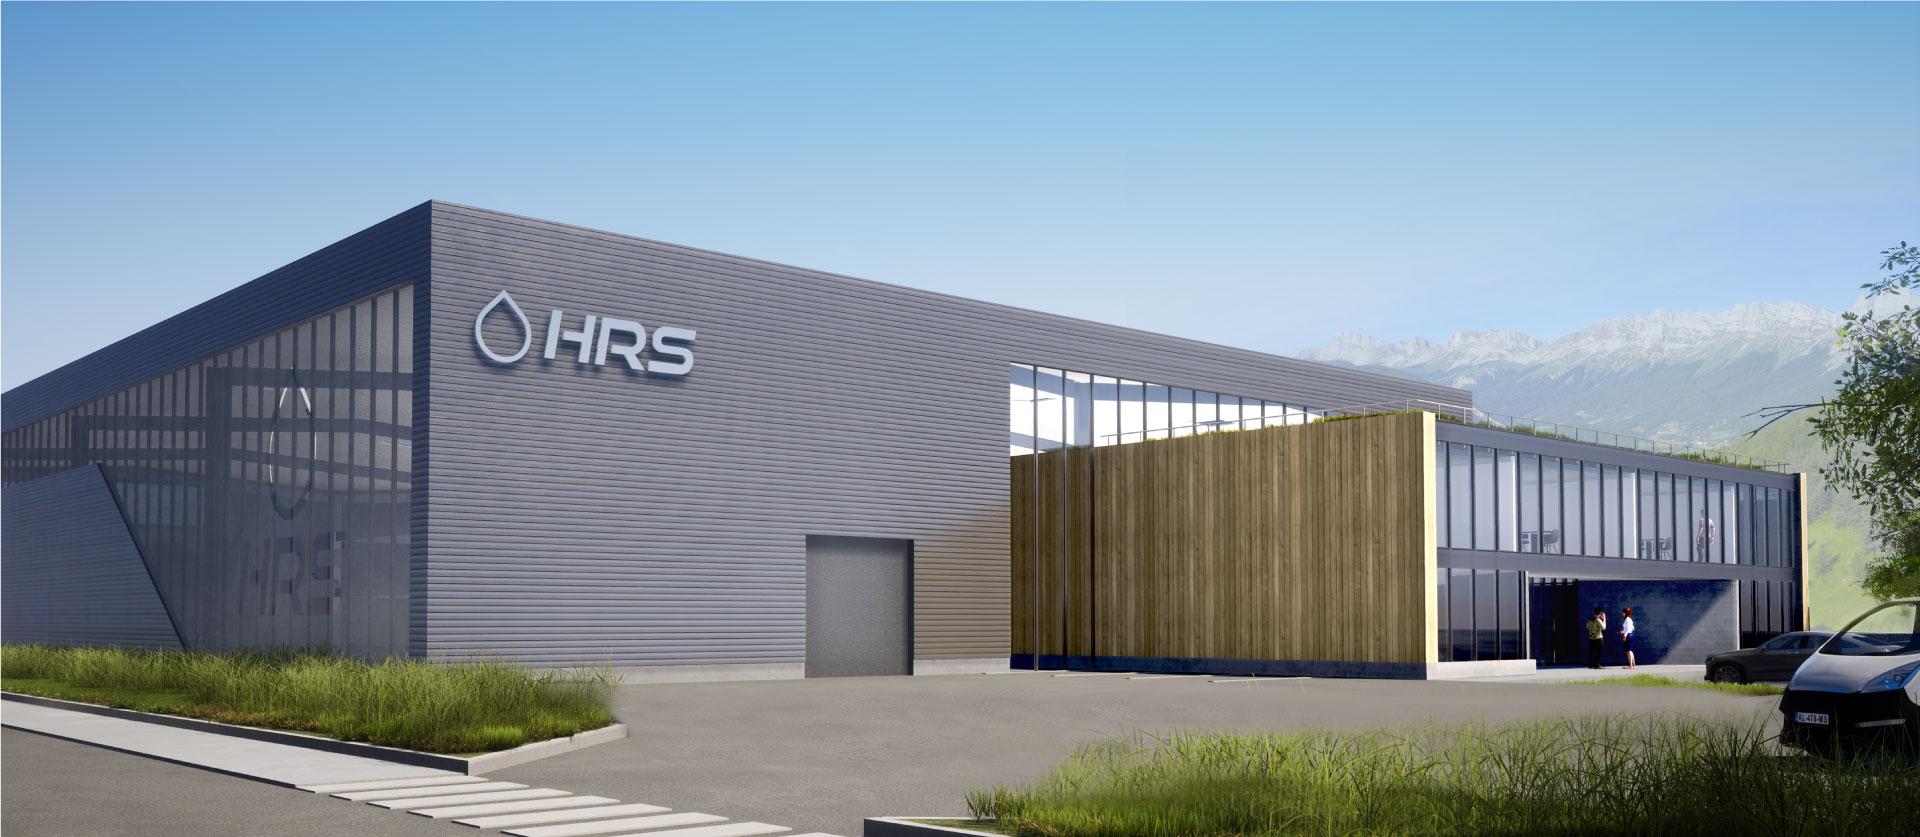 HRS - Usine Hydrogène Refueling Solutions